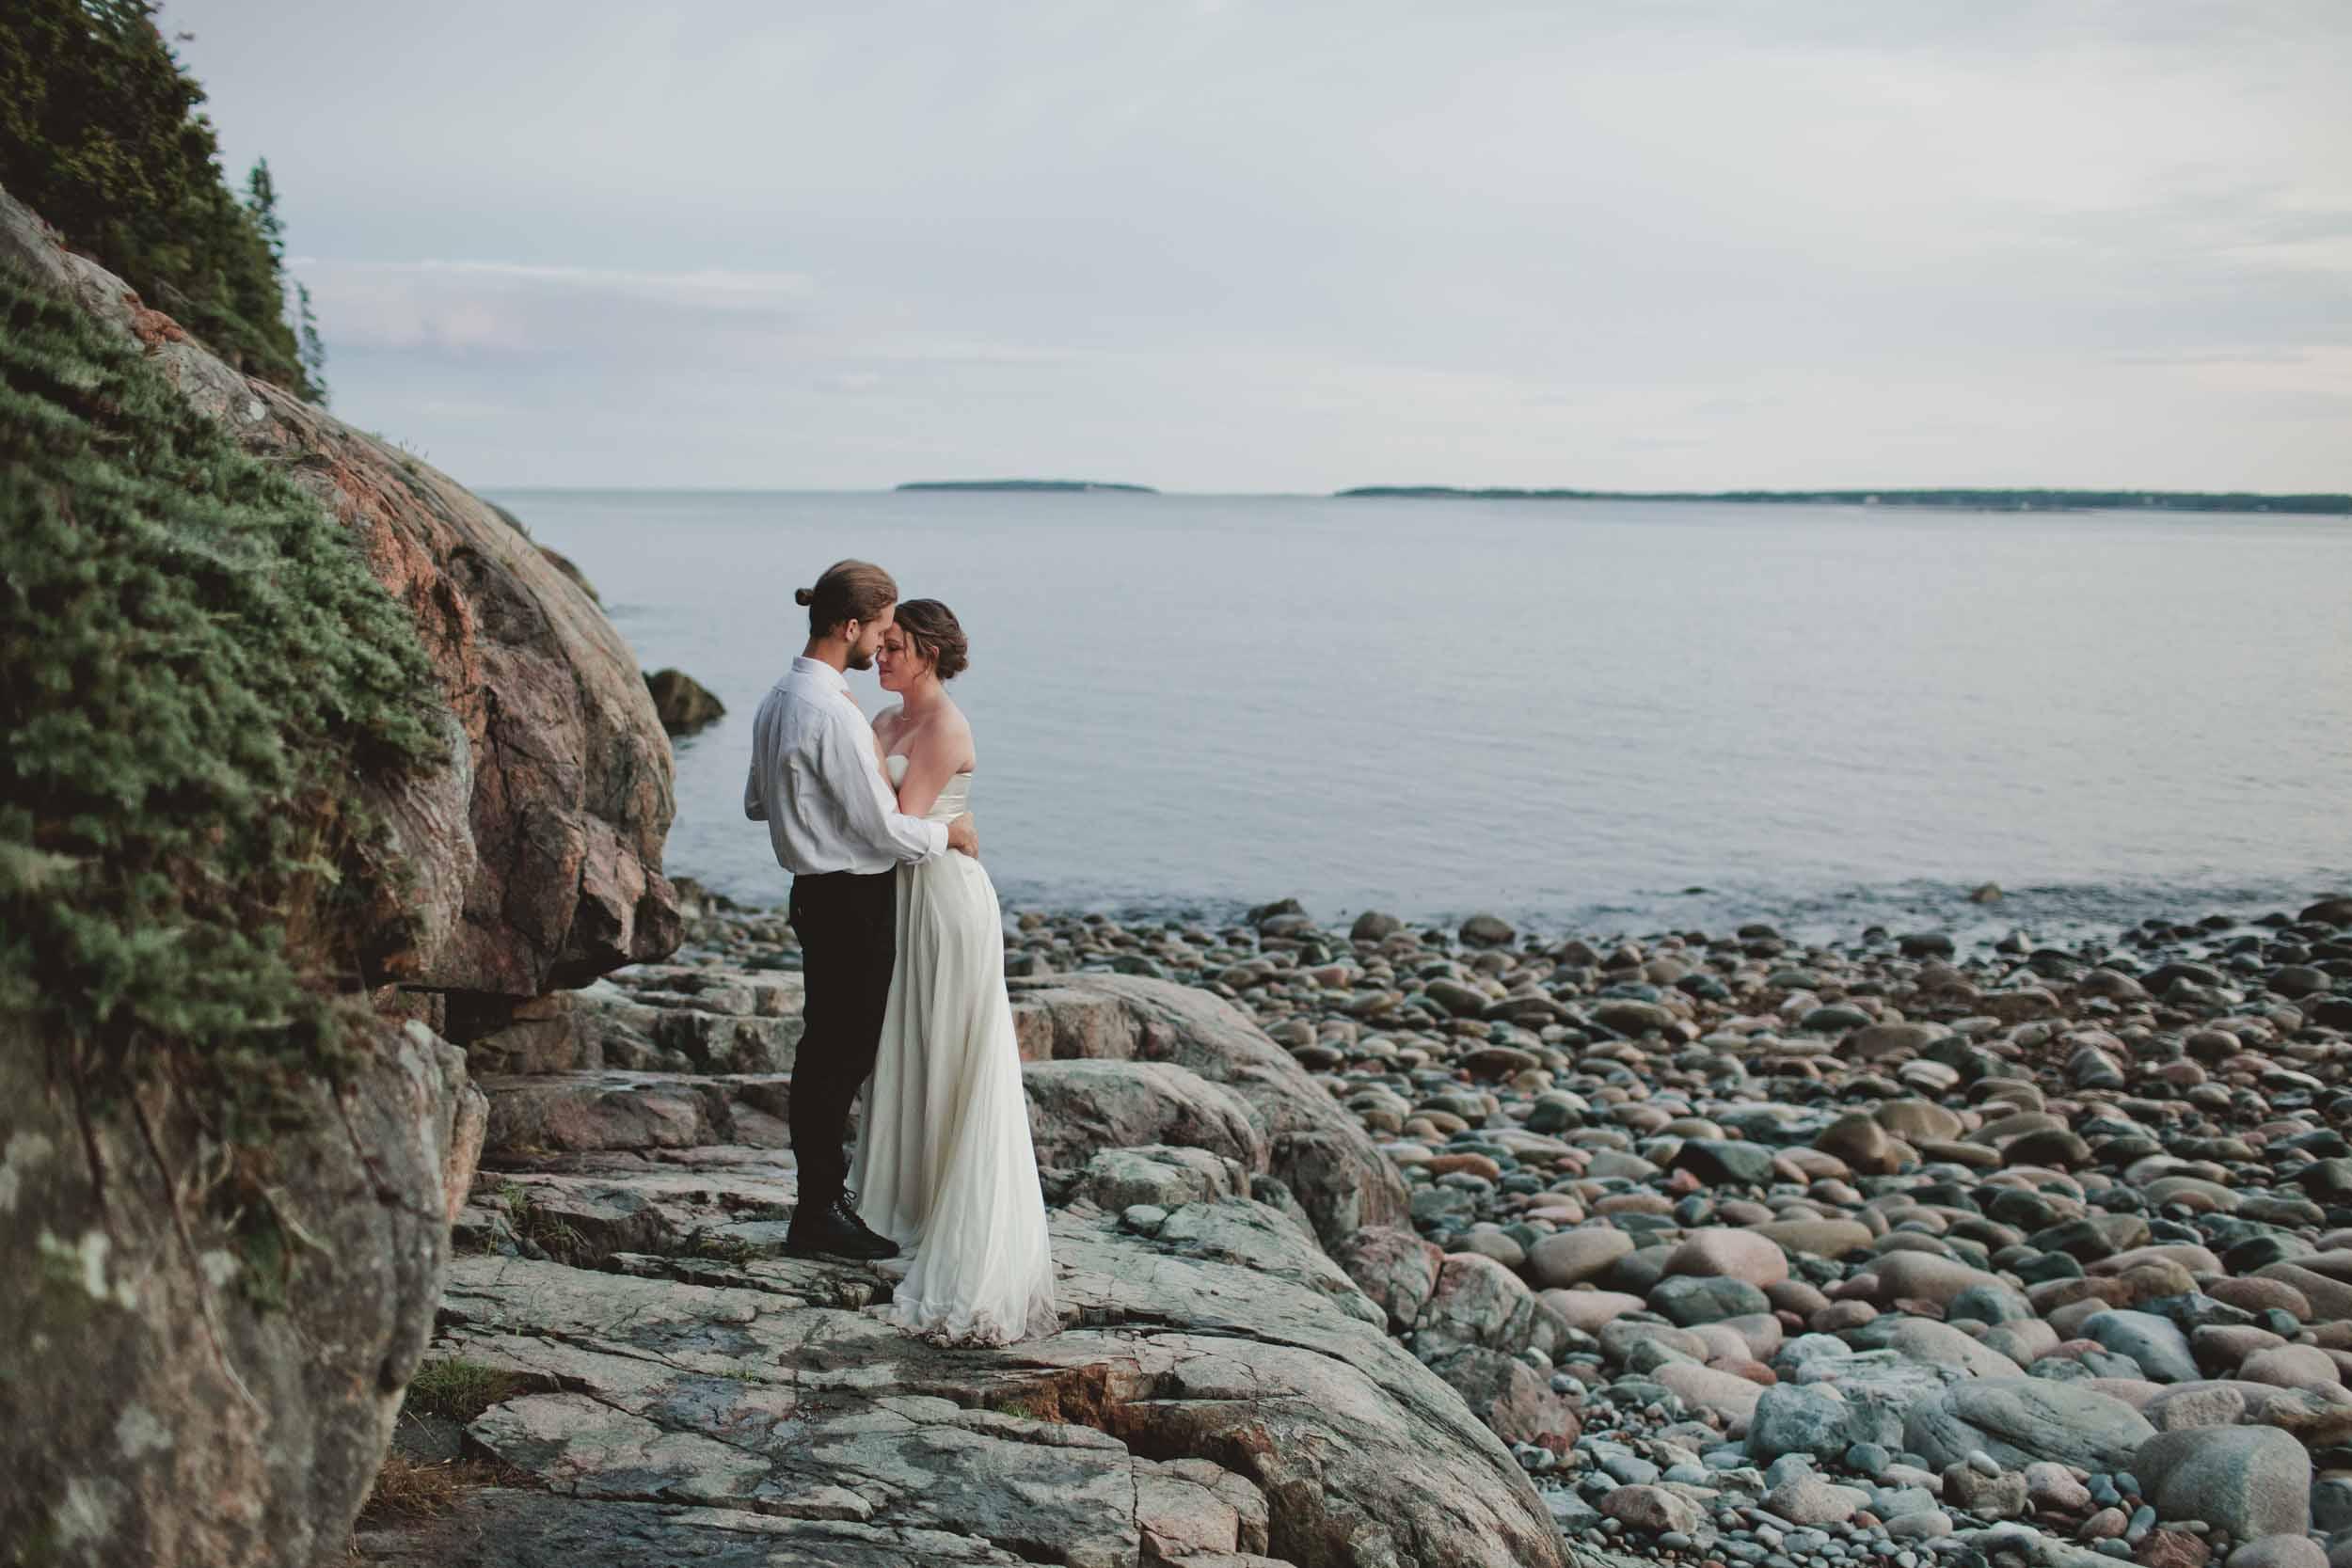 Maine-Elopement-Photographer44.jpg